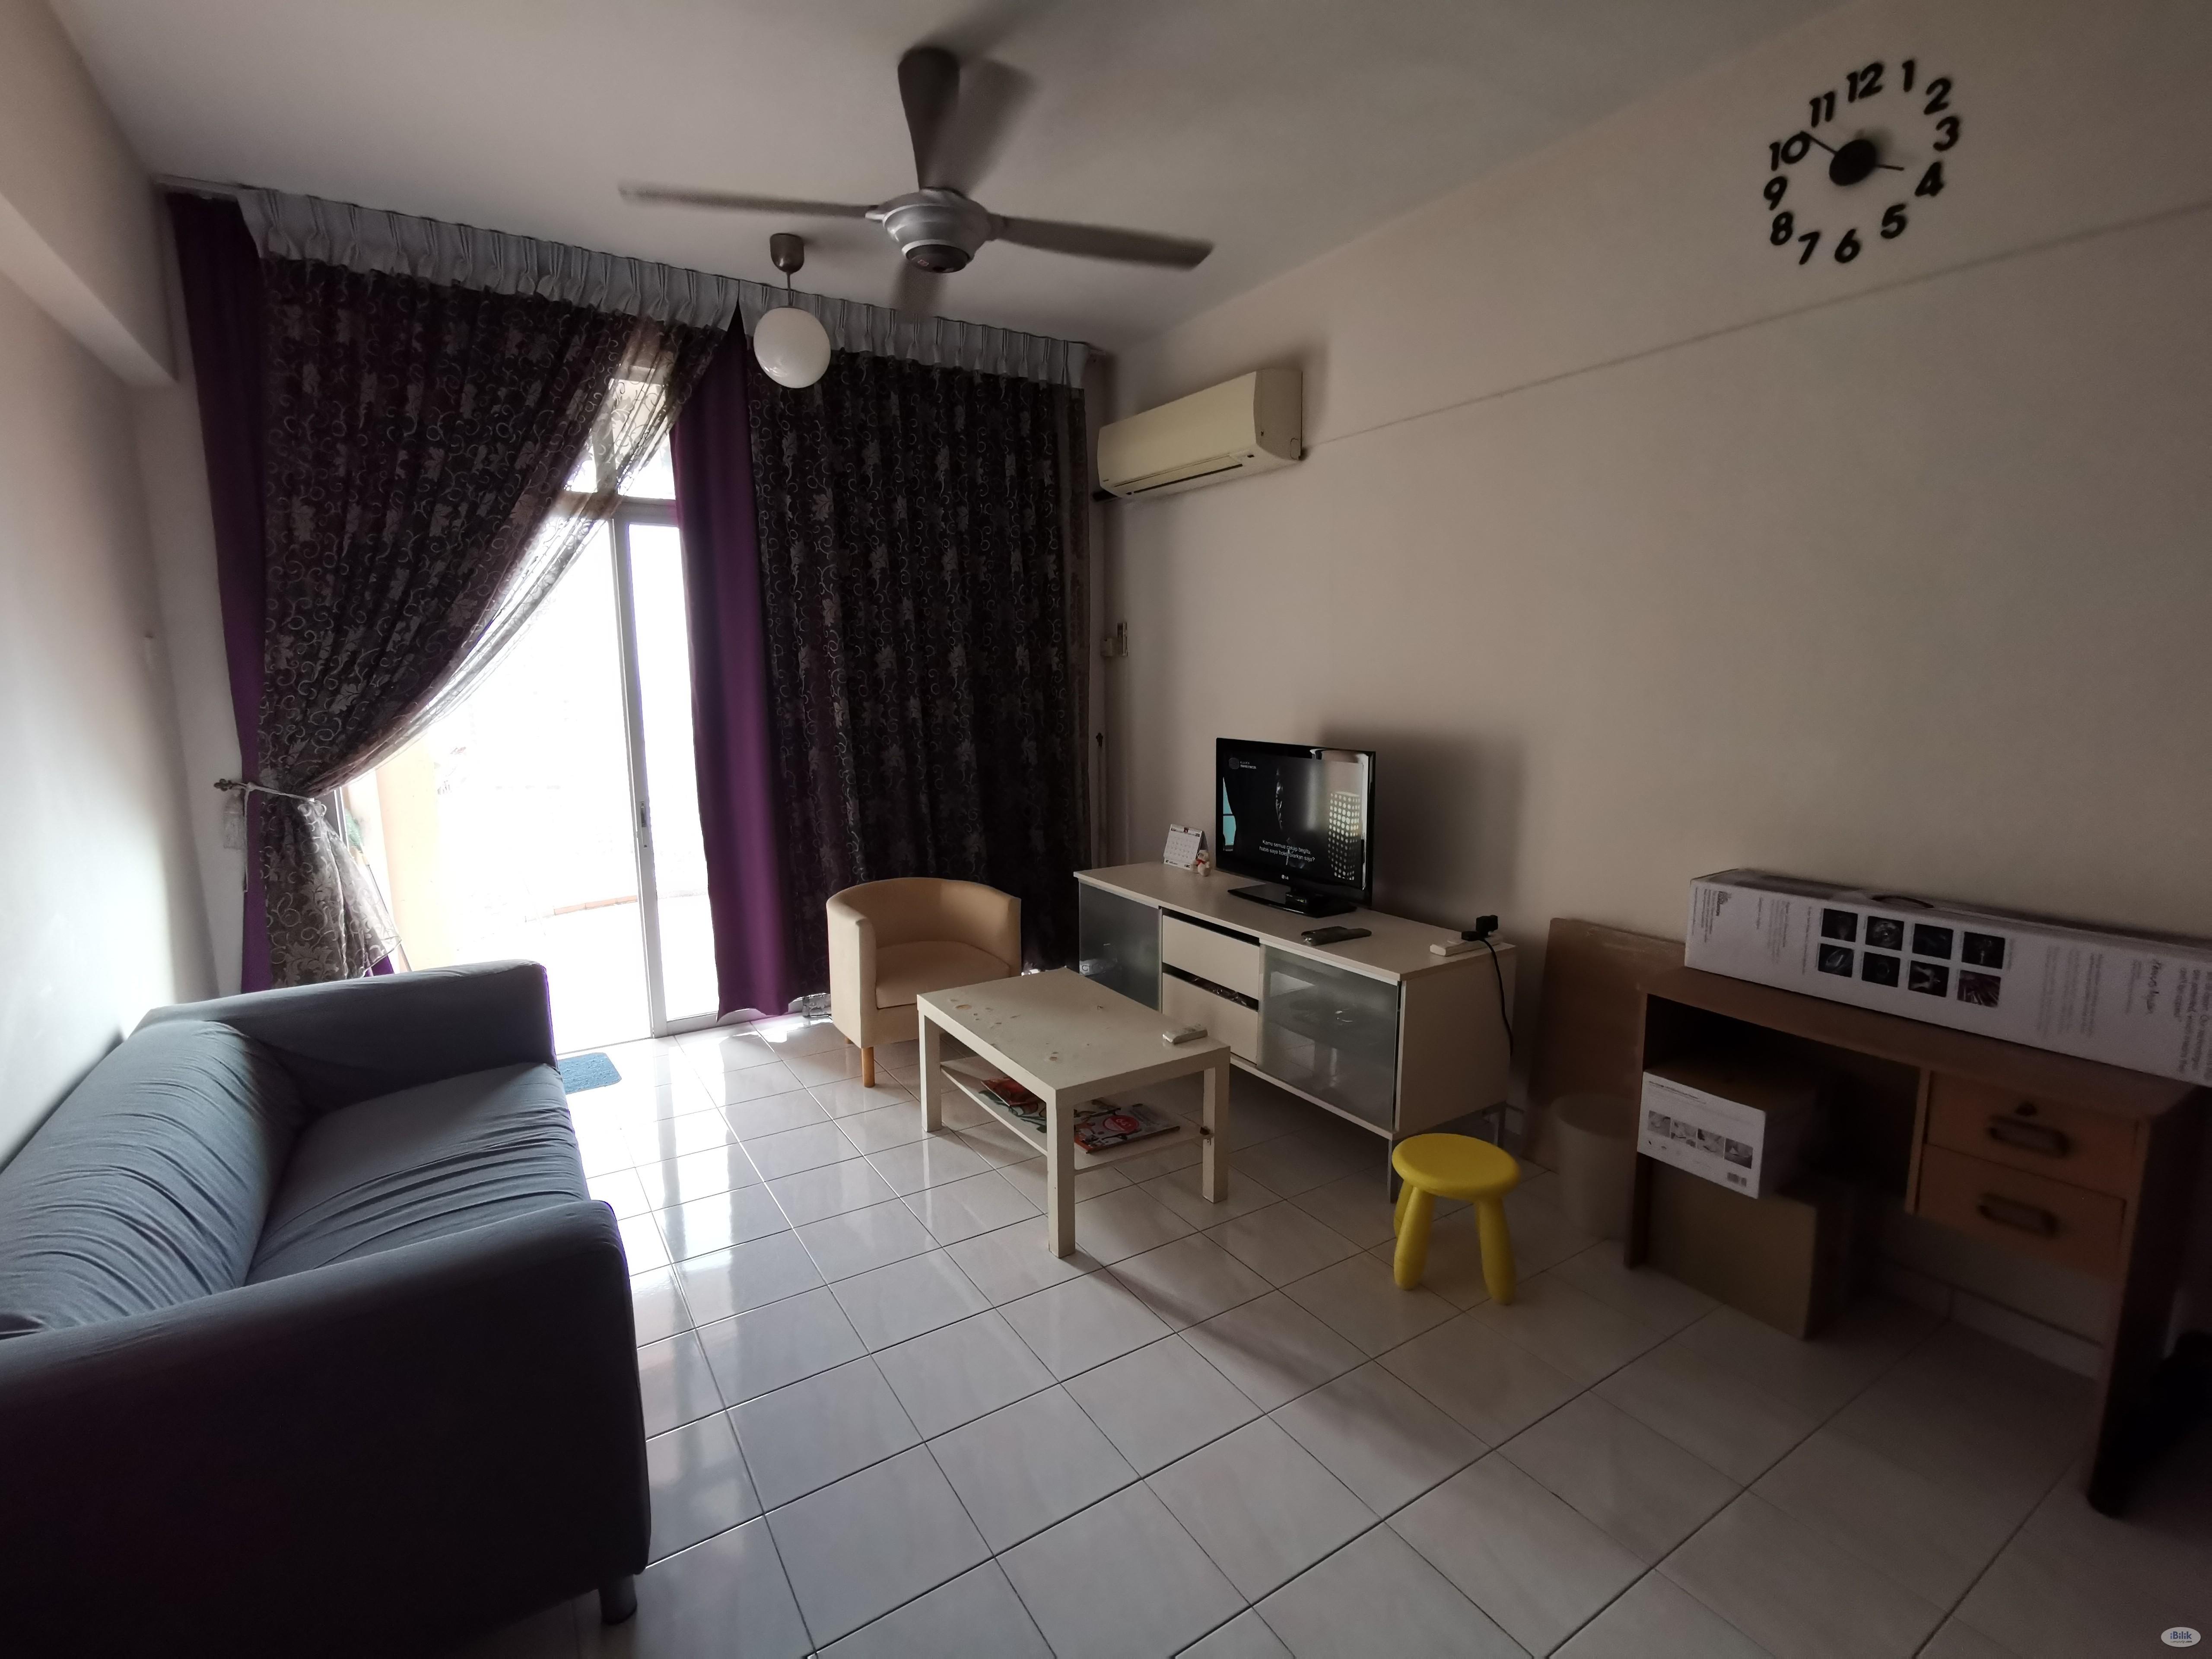 Medium Room at Wangsa Metroview [Move in October]